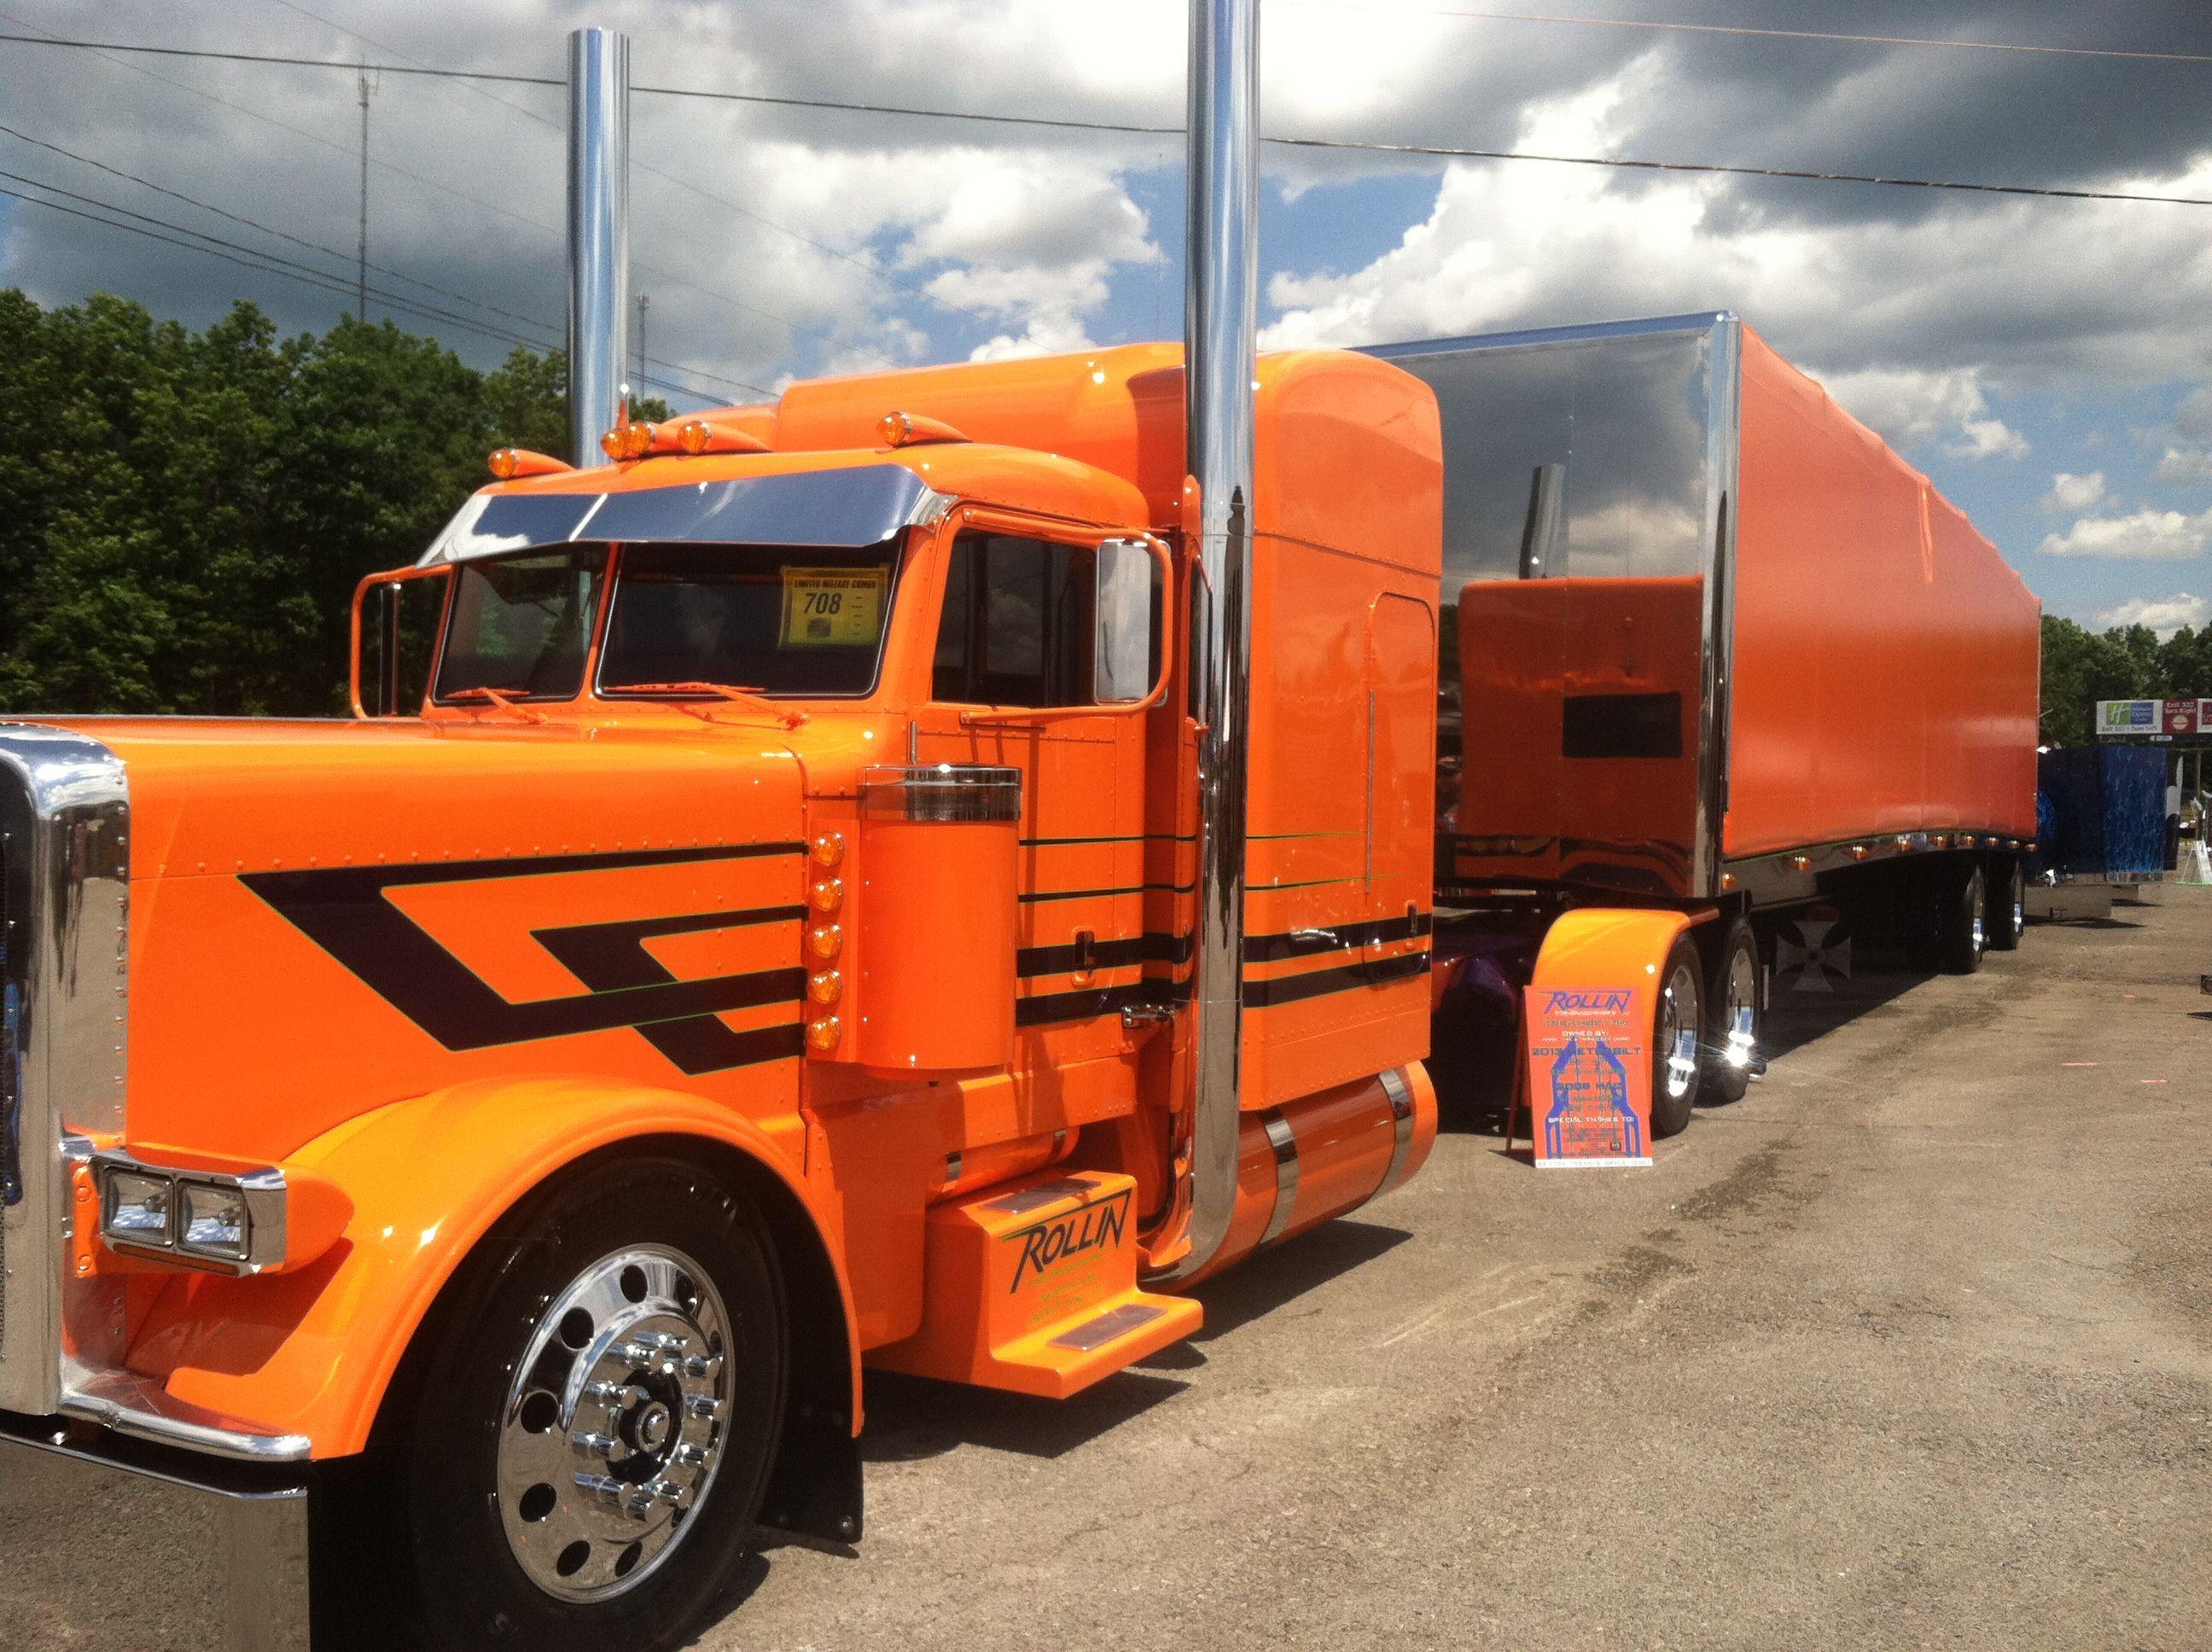 Trucks Custom Big Rig Orange : Peterbuilt cool orange trucks pinterest rigs